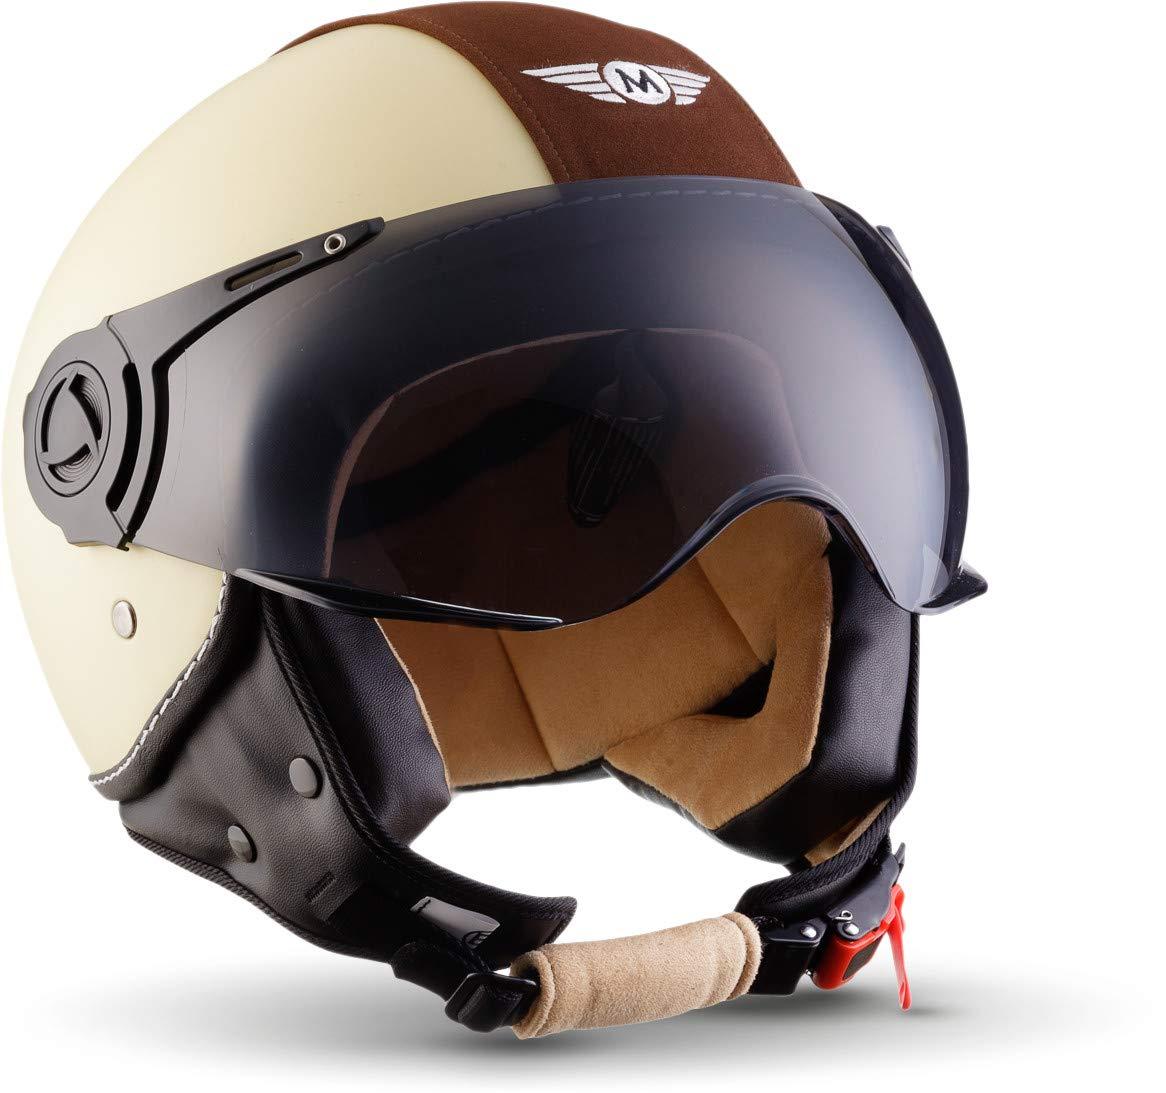 55-56cm Cloth Bag /· Beige /· S Sun Visor /· incl MOTO H44 Vintage Creme /· Vespa-Helmet Retro Vintage Mofa Pilot Moto-Helmet Bobber Scooter-Helmet Chopper Cruiser Biker Jet-Helmet /· ECE certified /· incl